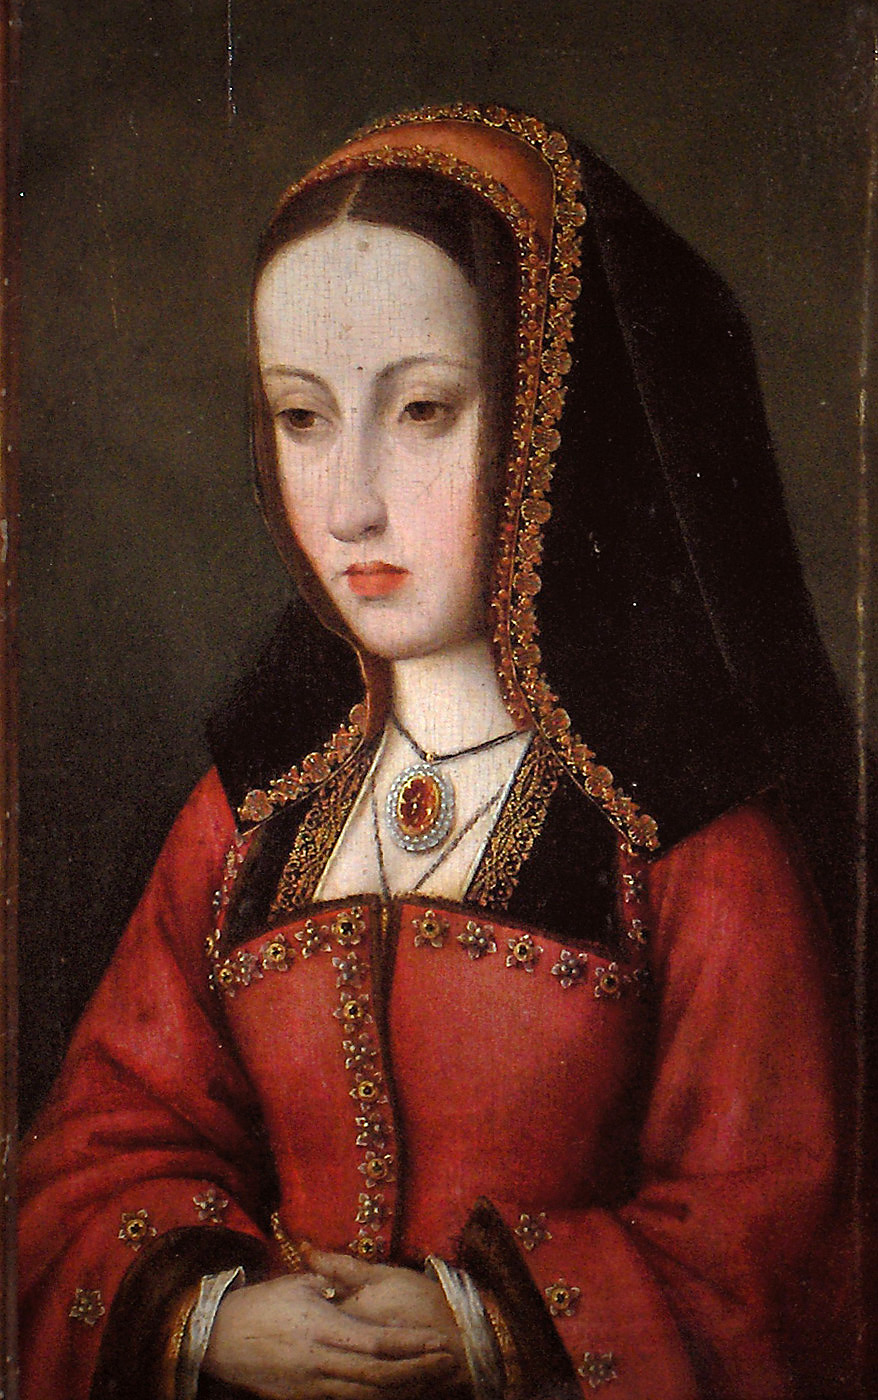 Maestro de Affligem. Juana I de Castilla. Hacia 1500. Museo Nacional de Escultura. Valladolid.